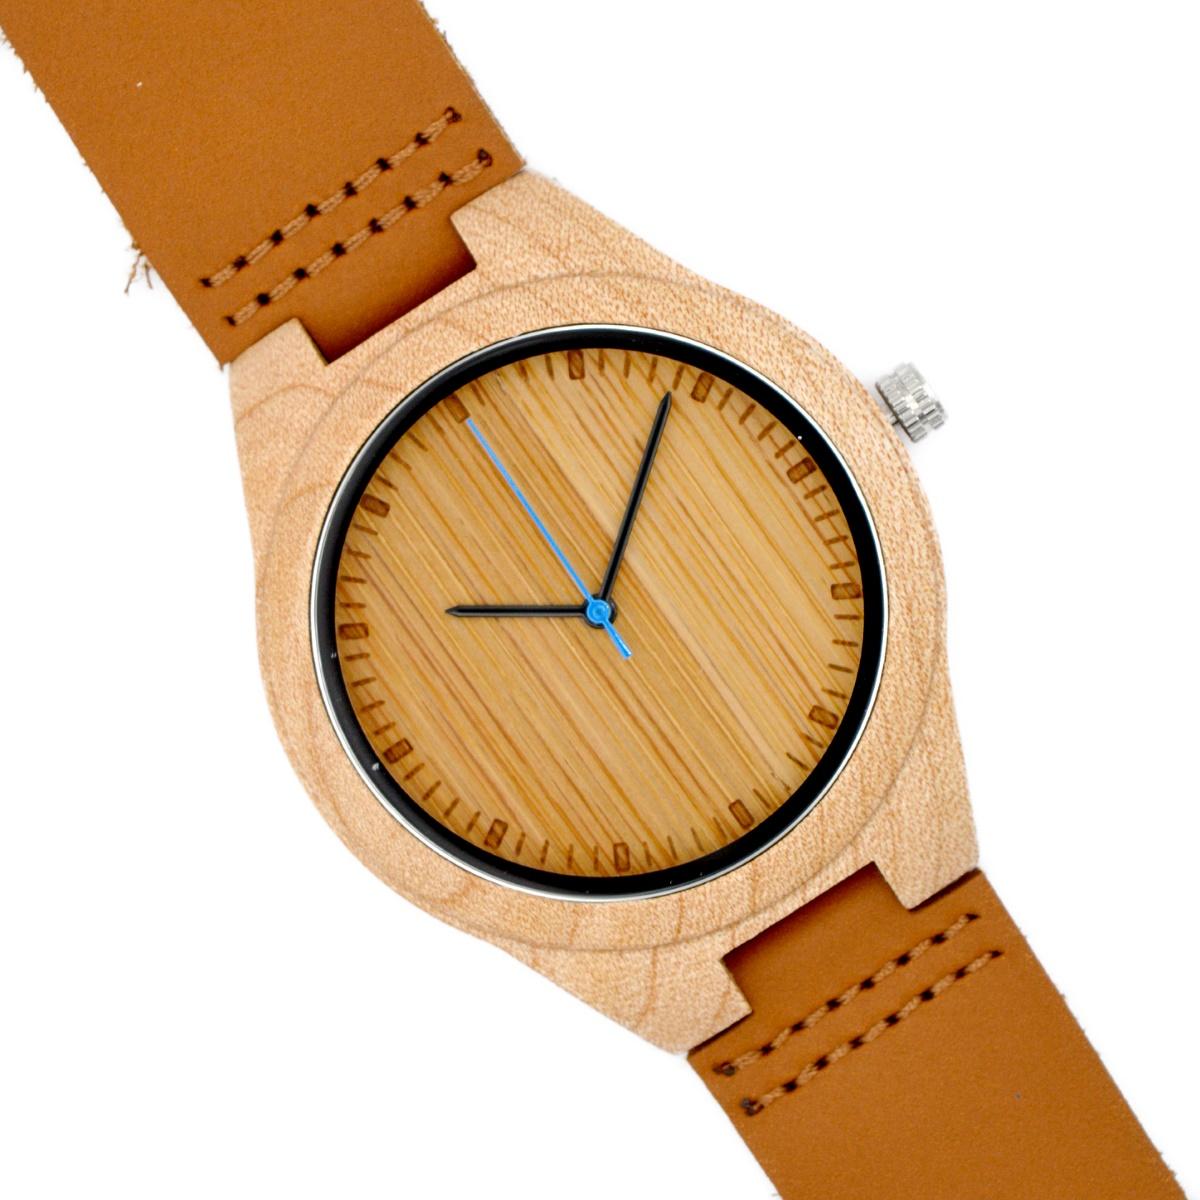 d6c24e240643 Reloj de pulsera de madera de olivo modelo Deva - Woodenson